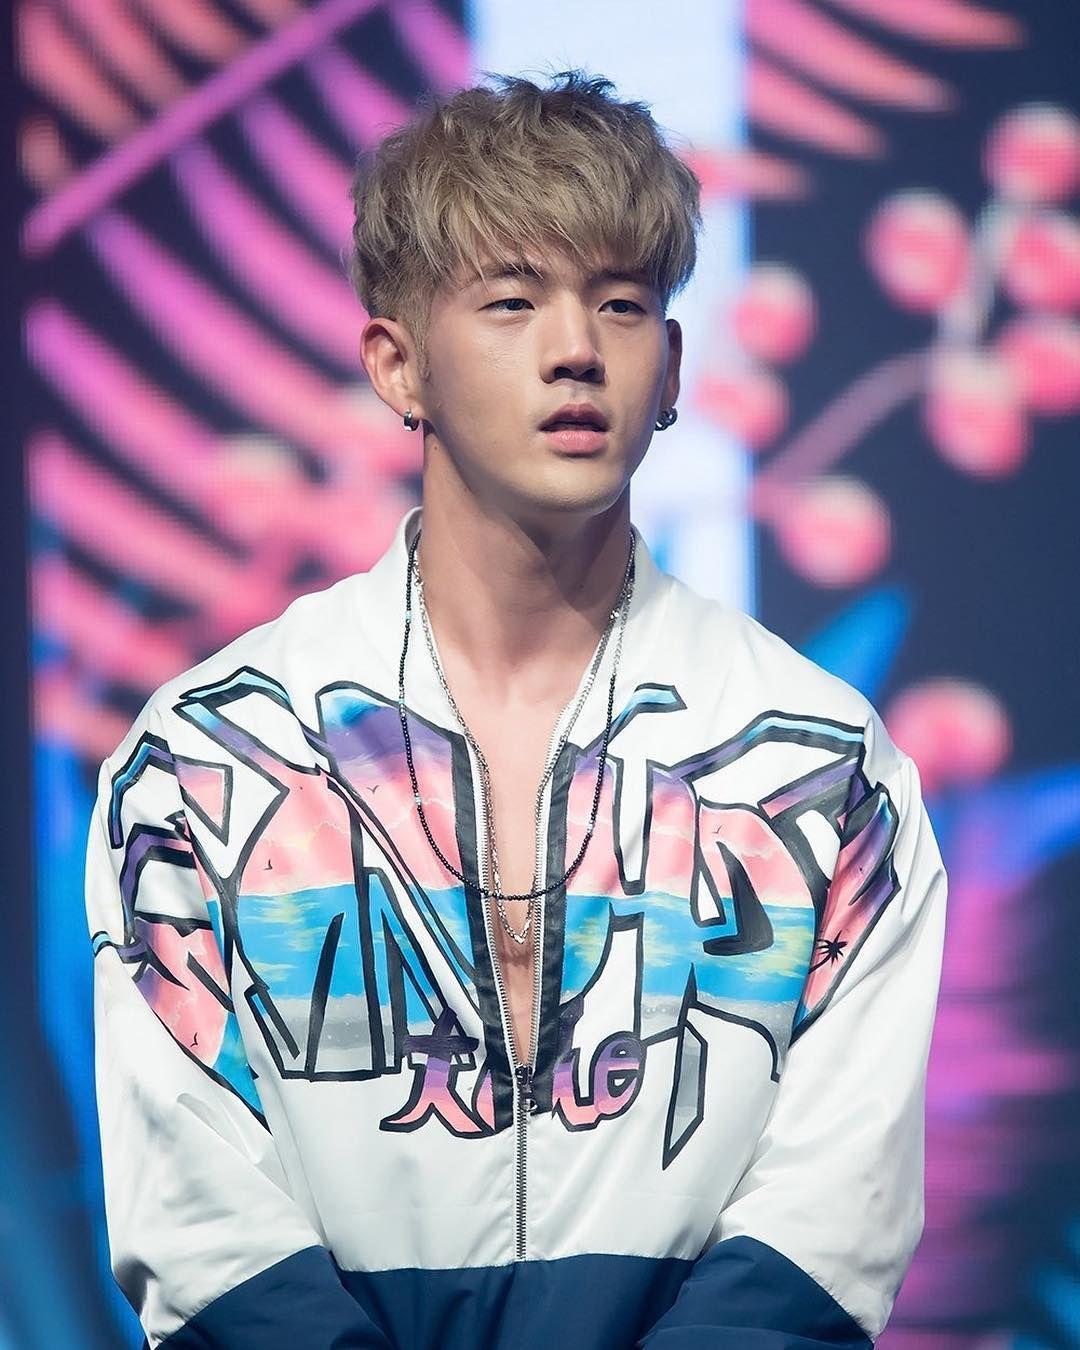 Most Handsome K Pop Male Idols Kard Bm Kim Woojin Matthew Kim Kpop K Pop Music K Pop Boy Groups Best K Pop Boy Bands T Kard Bm Kard Korean Music